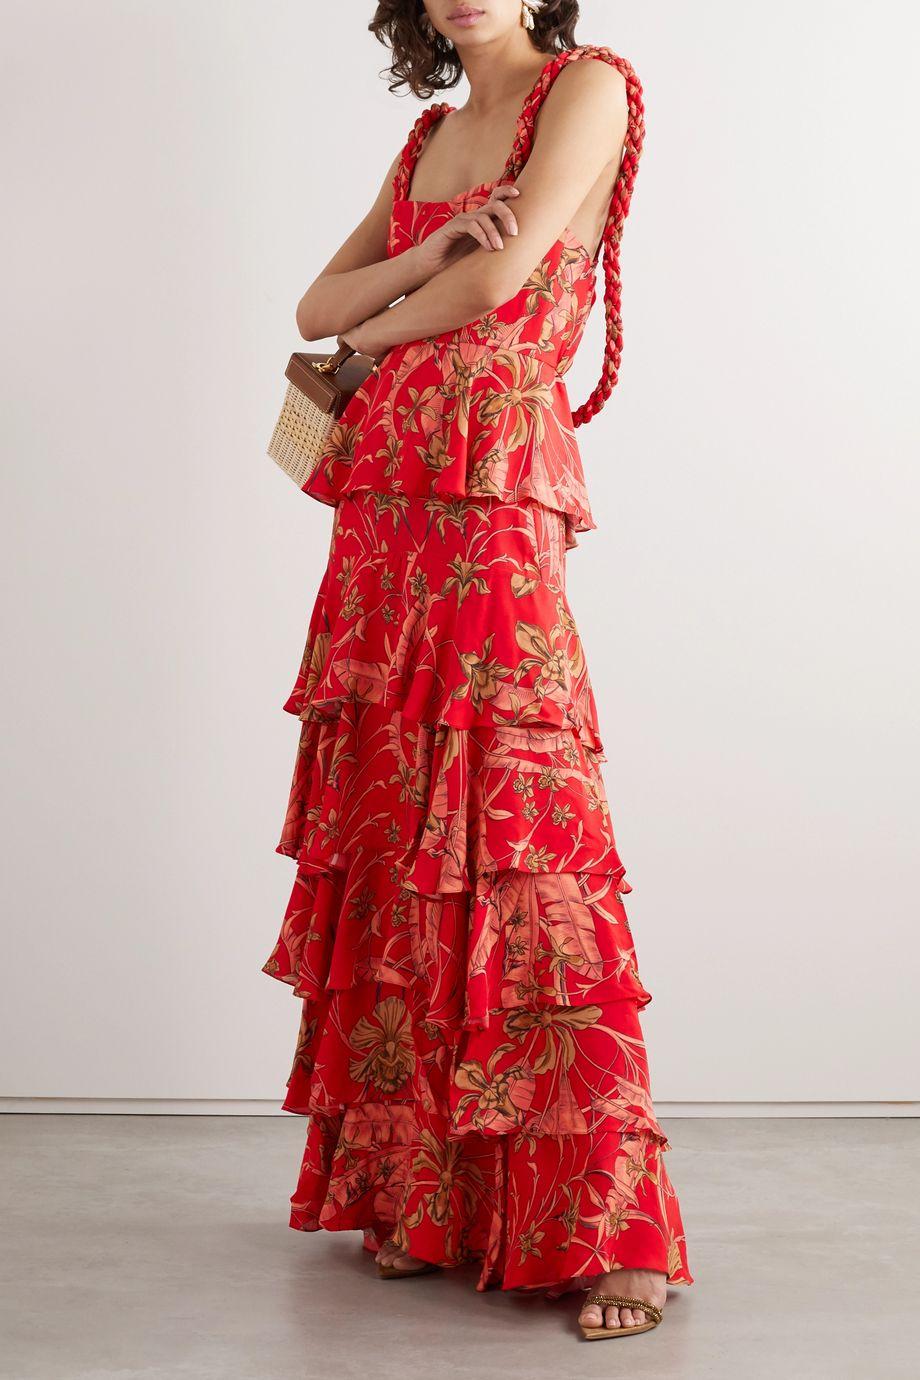 Johanna Ortiz Life Goals tiered printed crepe maxi dress